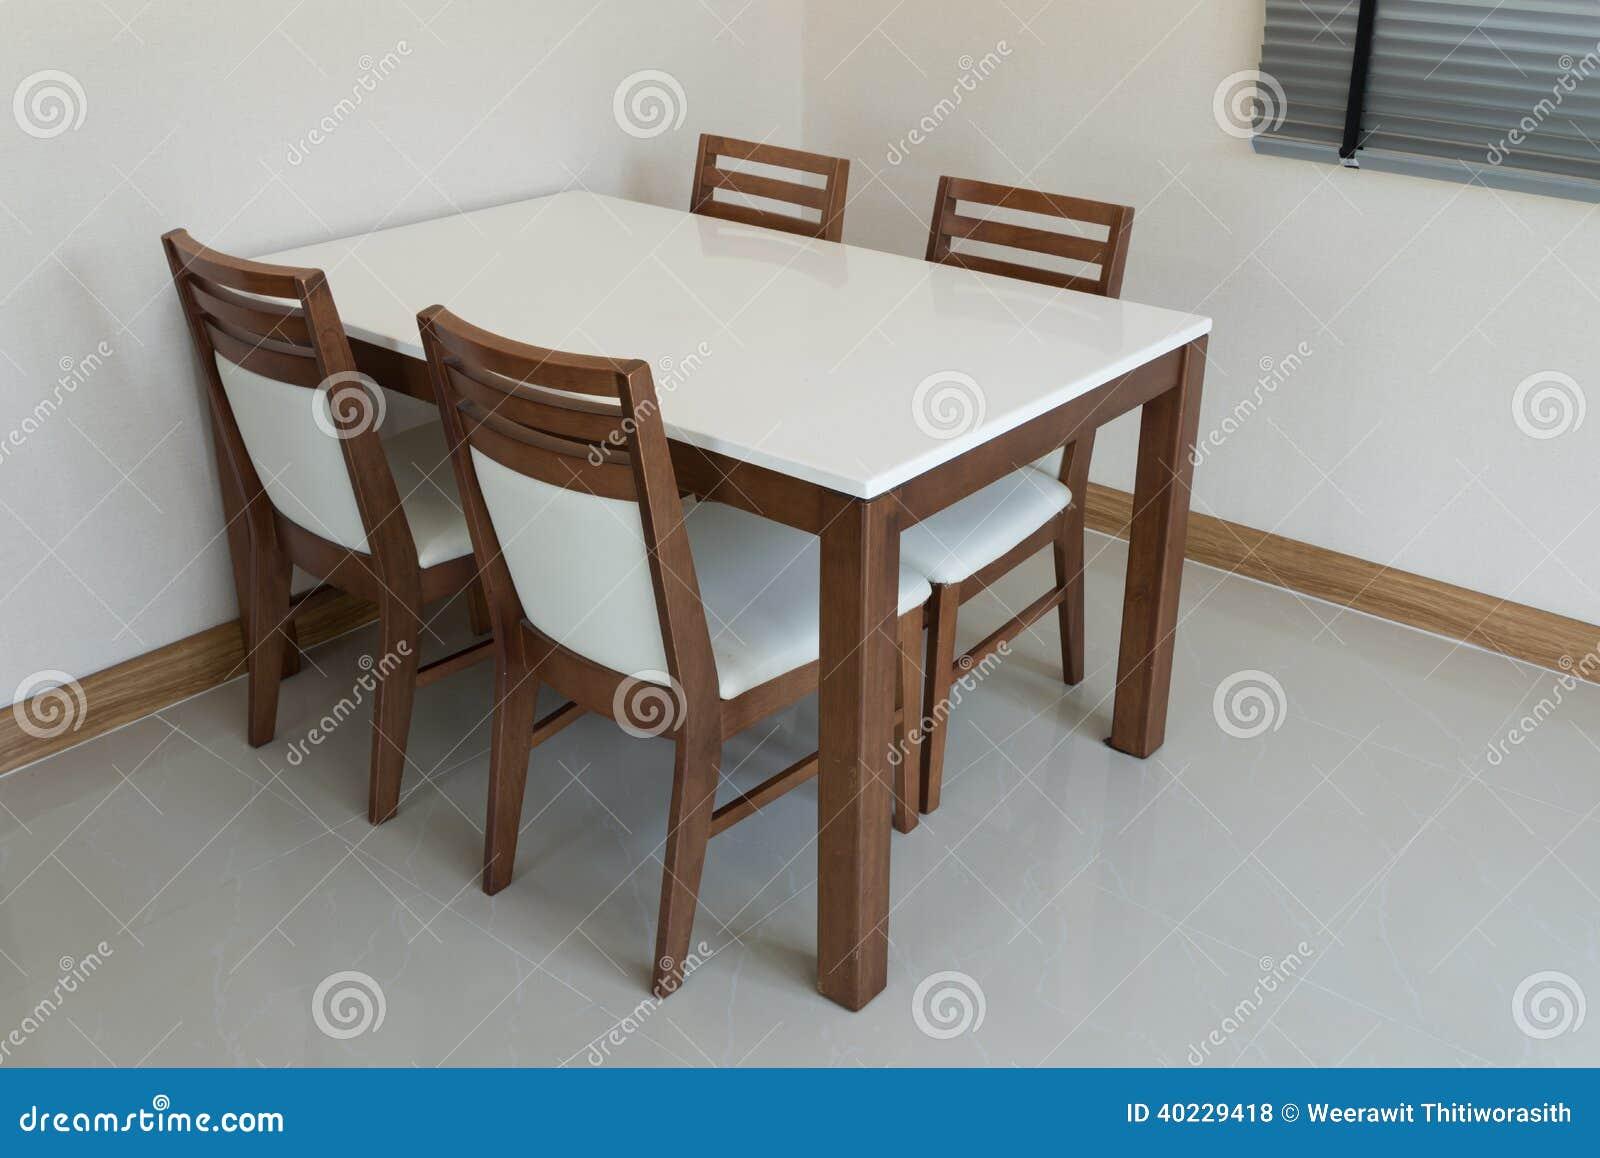 table de salle manger en bois photo stock image du conception fleur 40229418. Black Bedroom Furniture Sets. Home Design Ideas